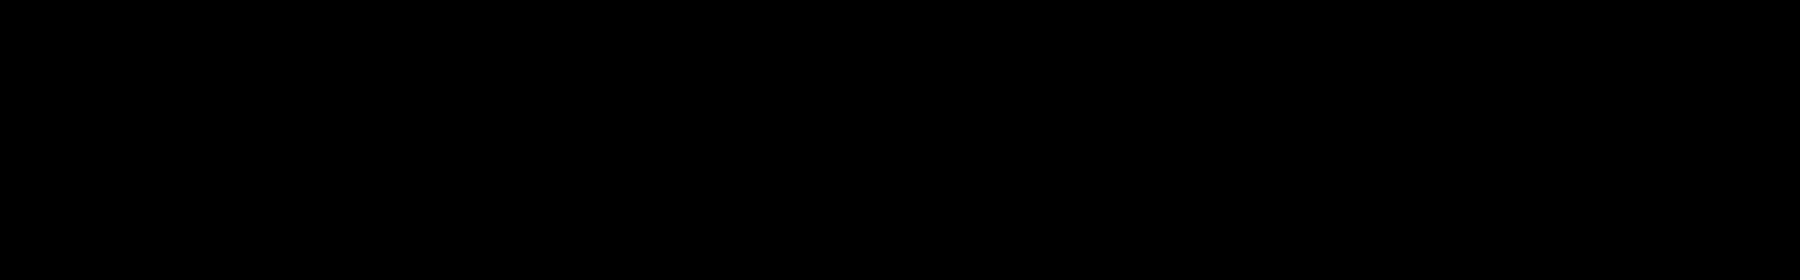 Piano Noir audio waveform